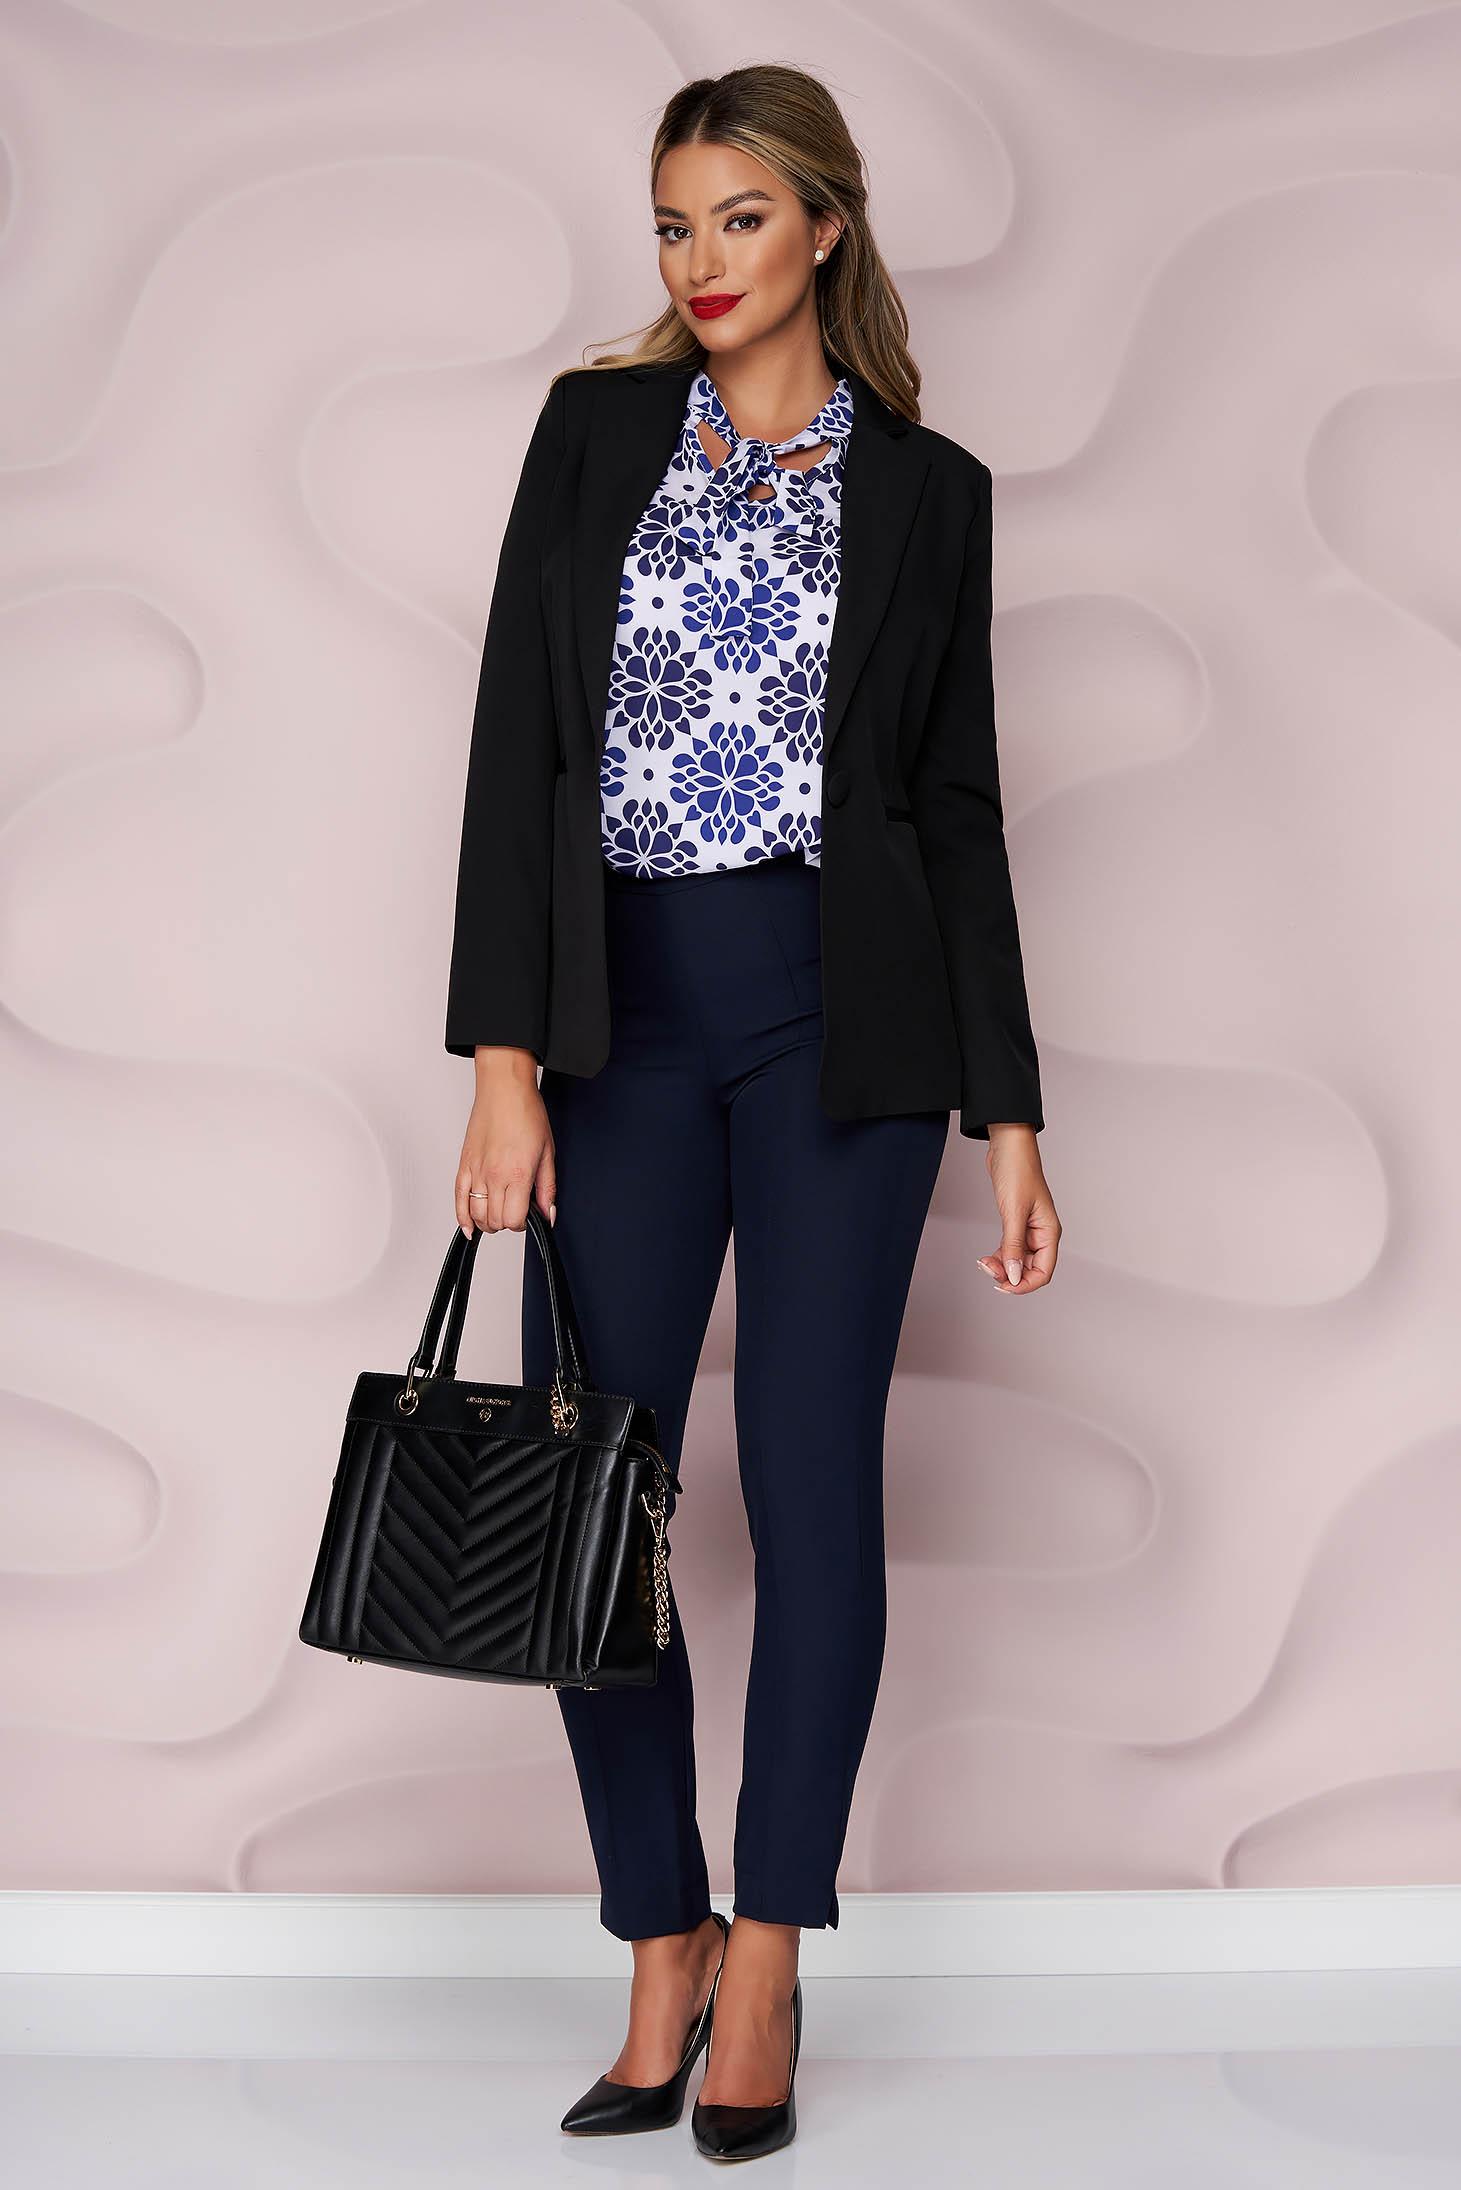 Bluza dama StarShinerS office cu croi larg asimetrica material subtire din material subtire si neelastic si imprimeu floral unic